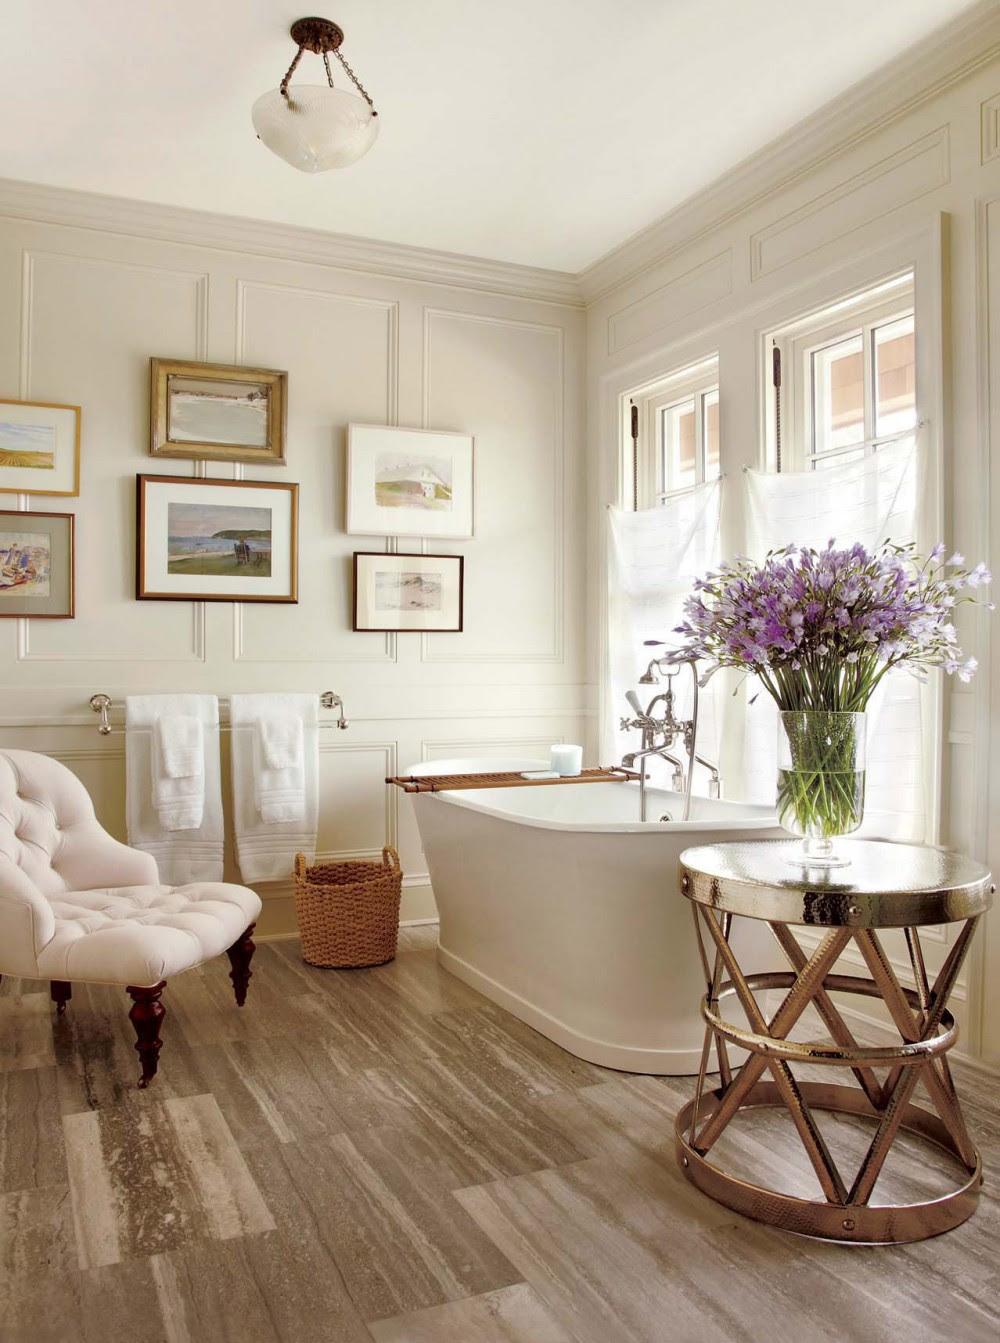 Bathroom - renovating, fixing, decorating, painting, ideas ...